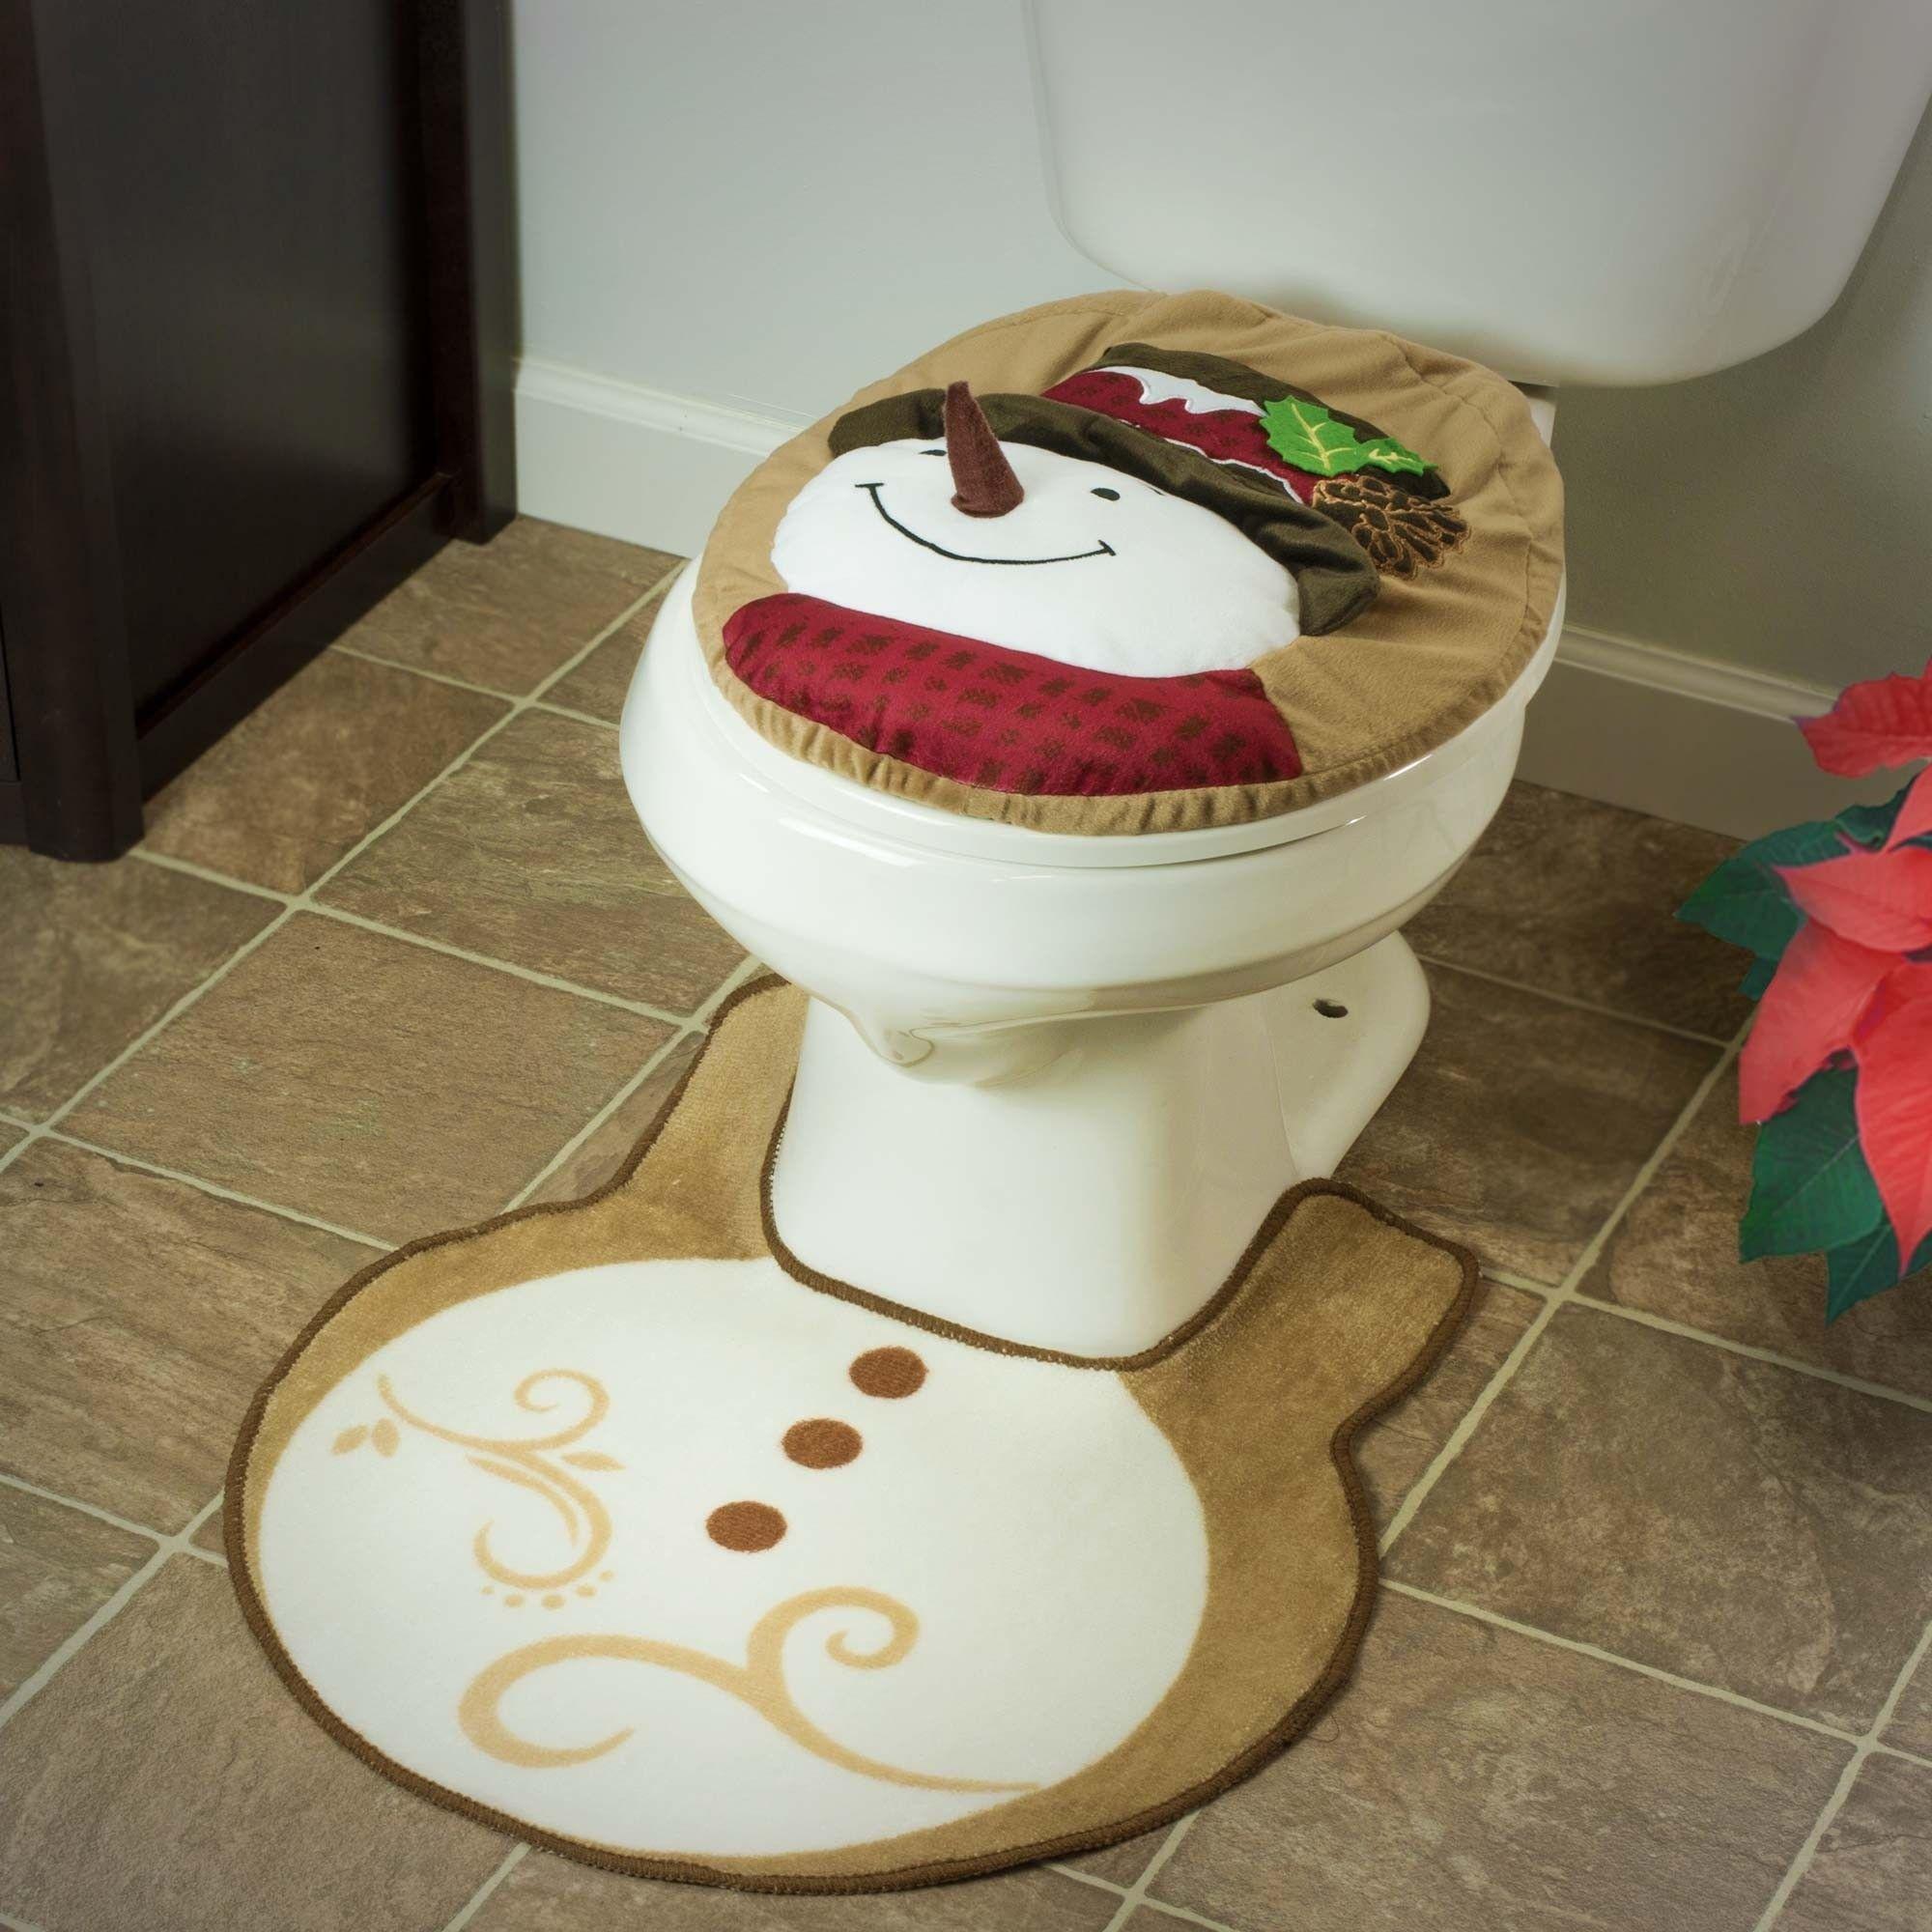 XMAS Christmas Snowman Toilet Seat Cover /& Rug Set for Bathroom Decoration JAZZ